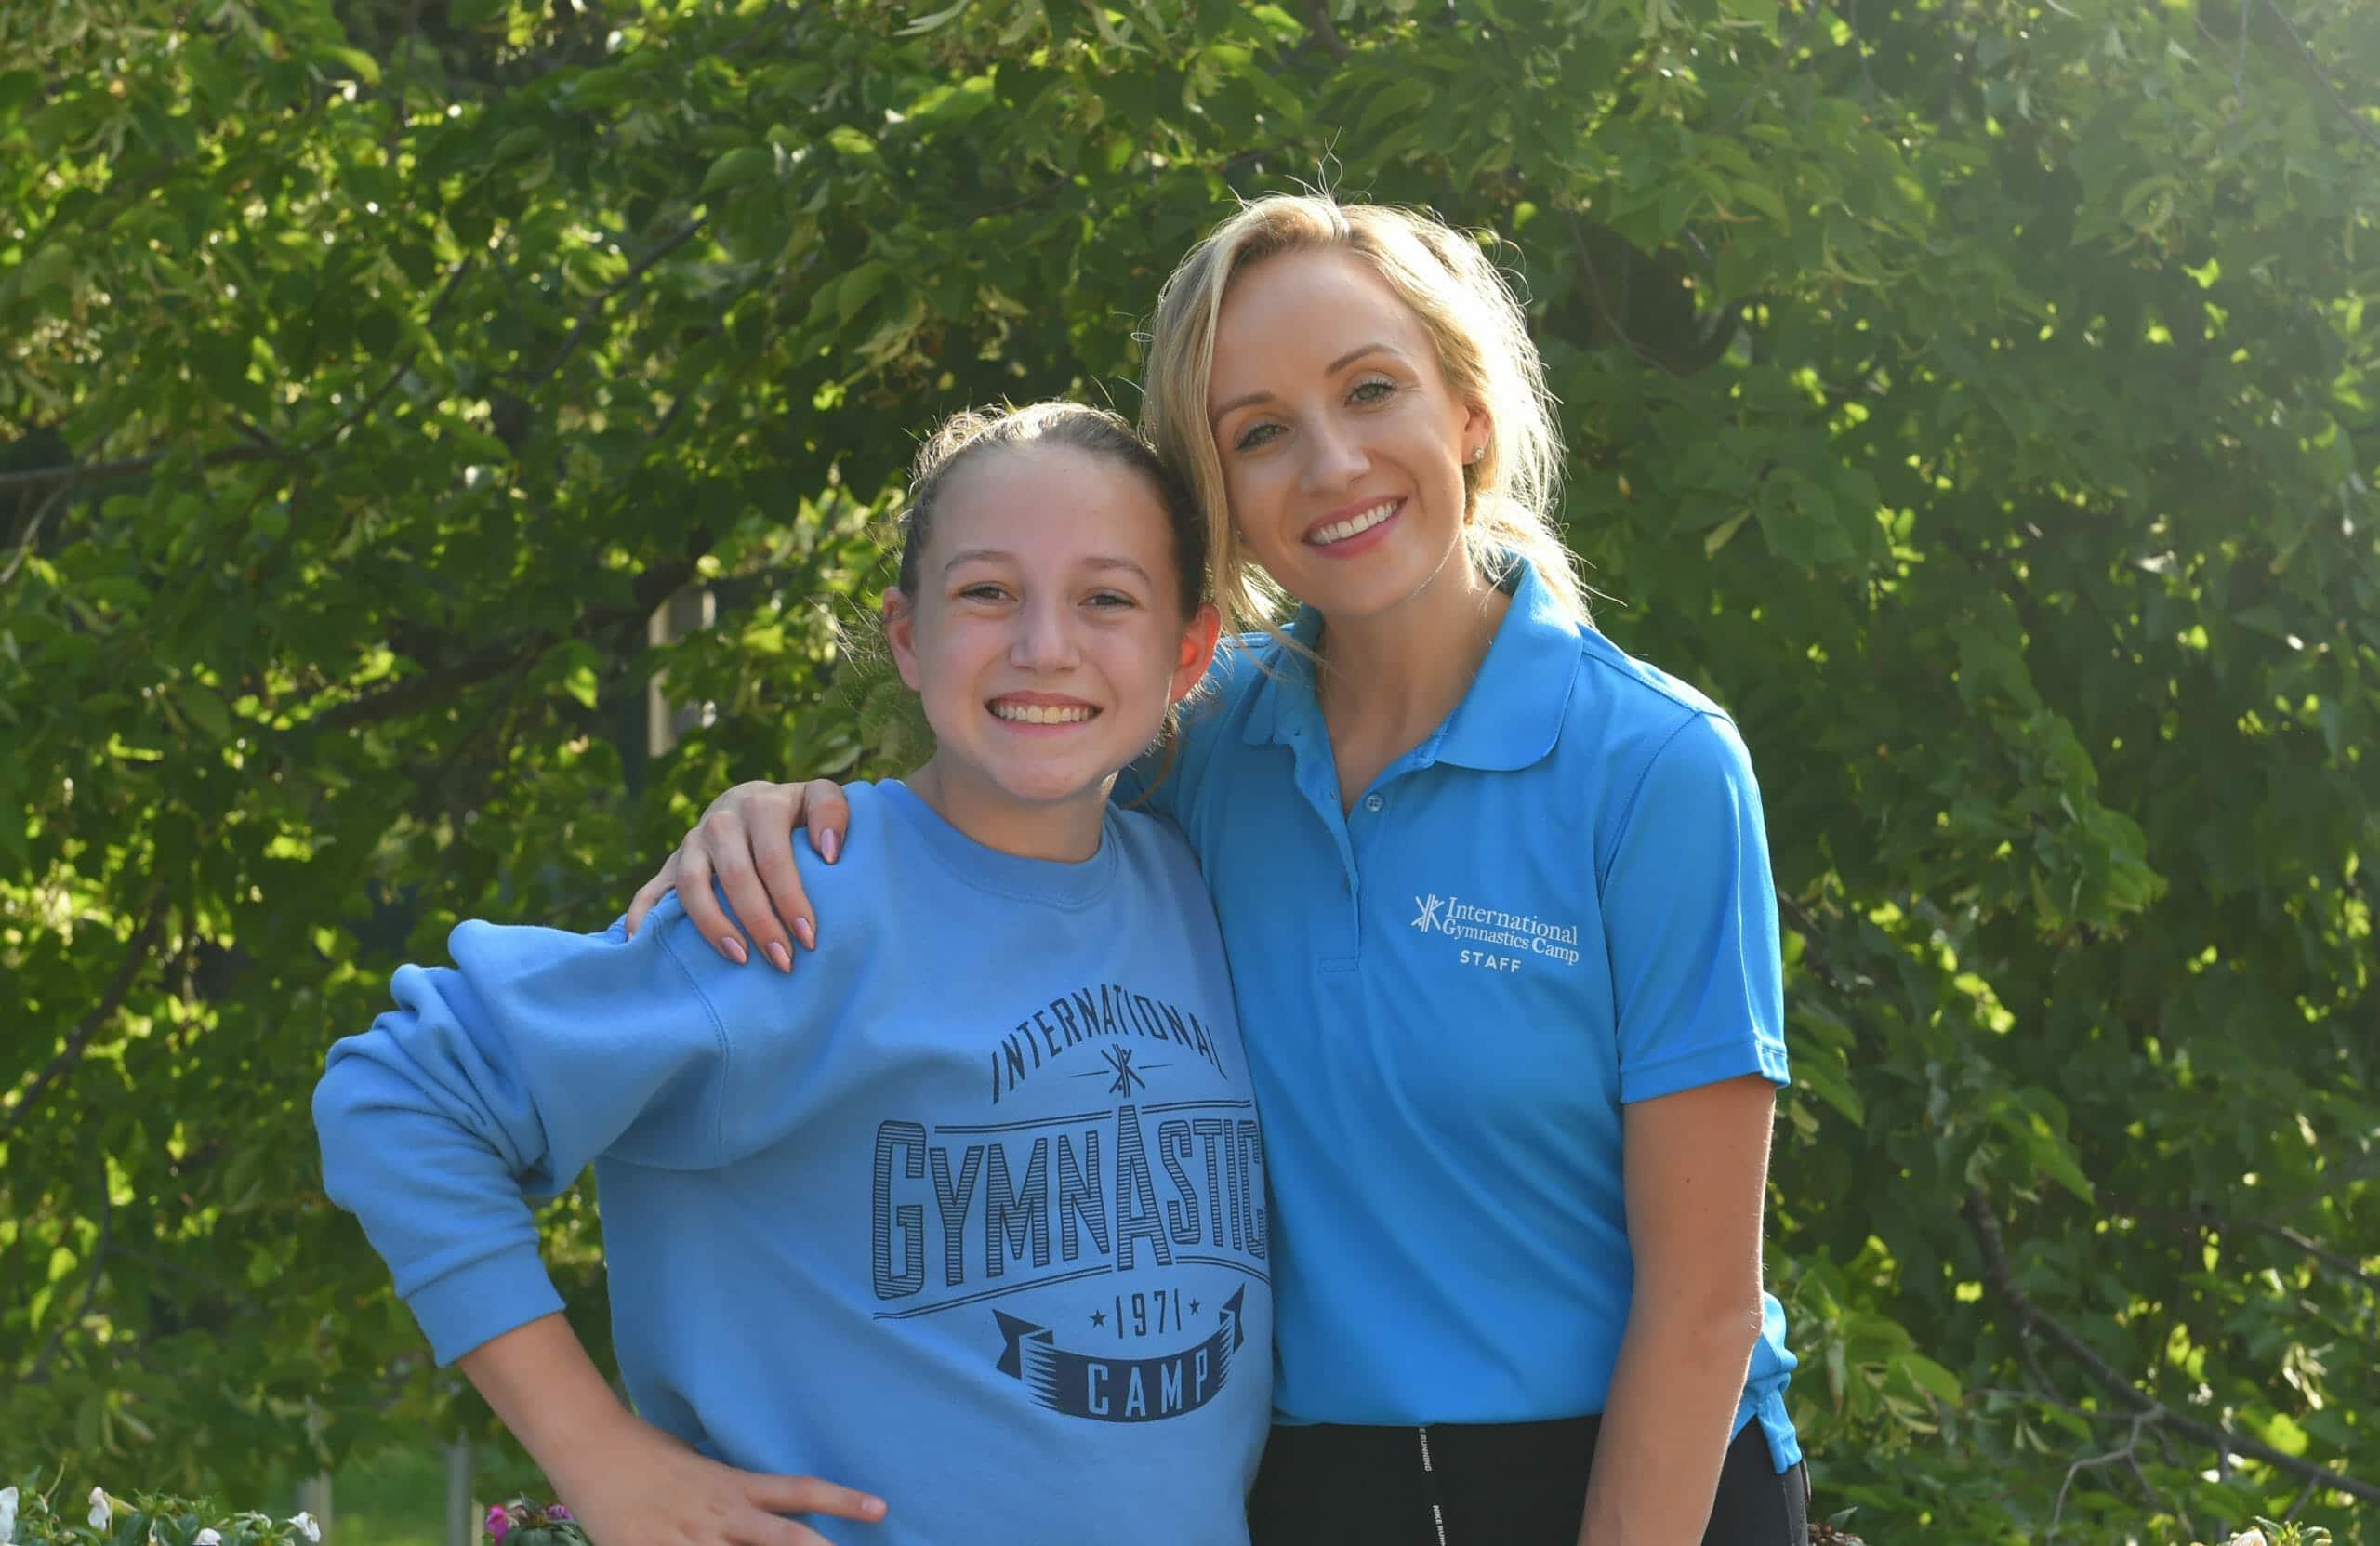 Nastia Liukin and young female gymnast